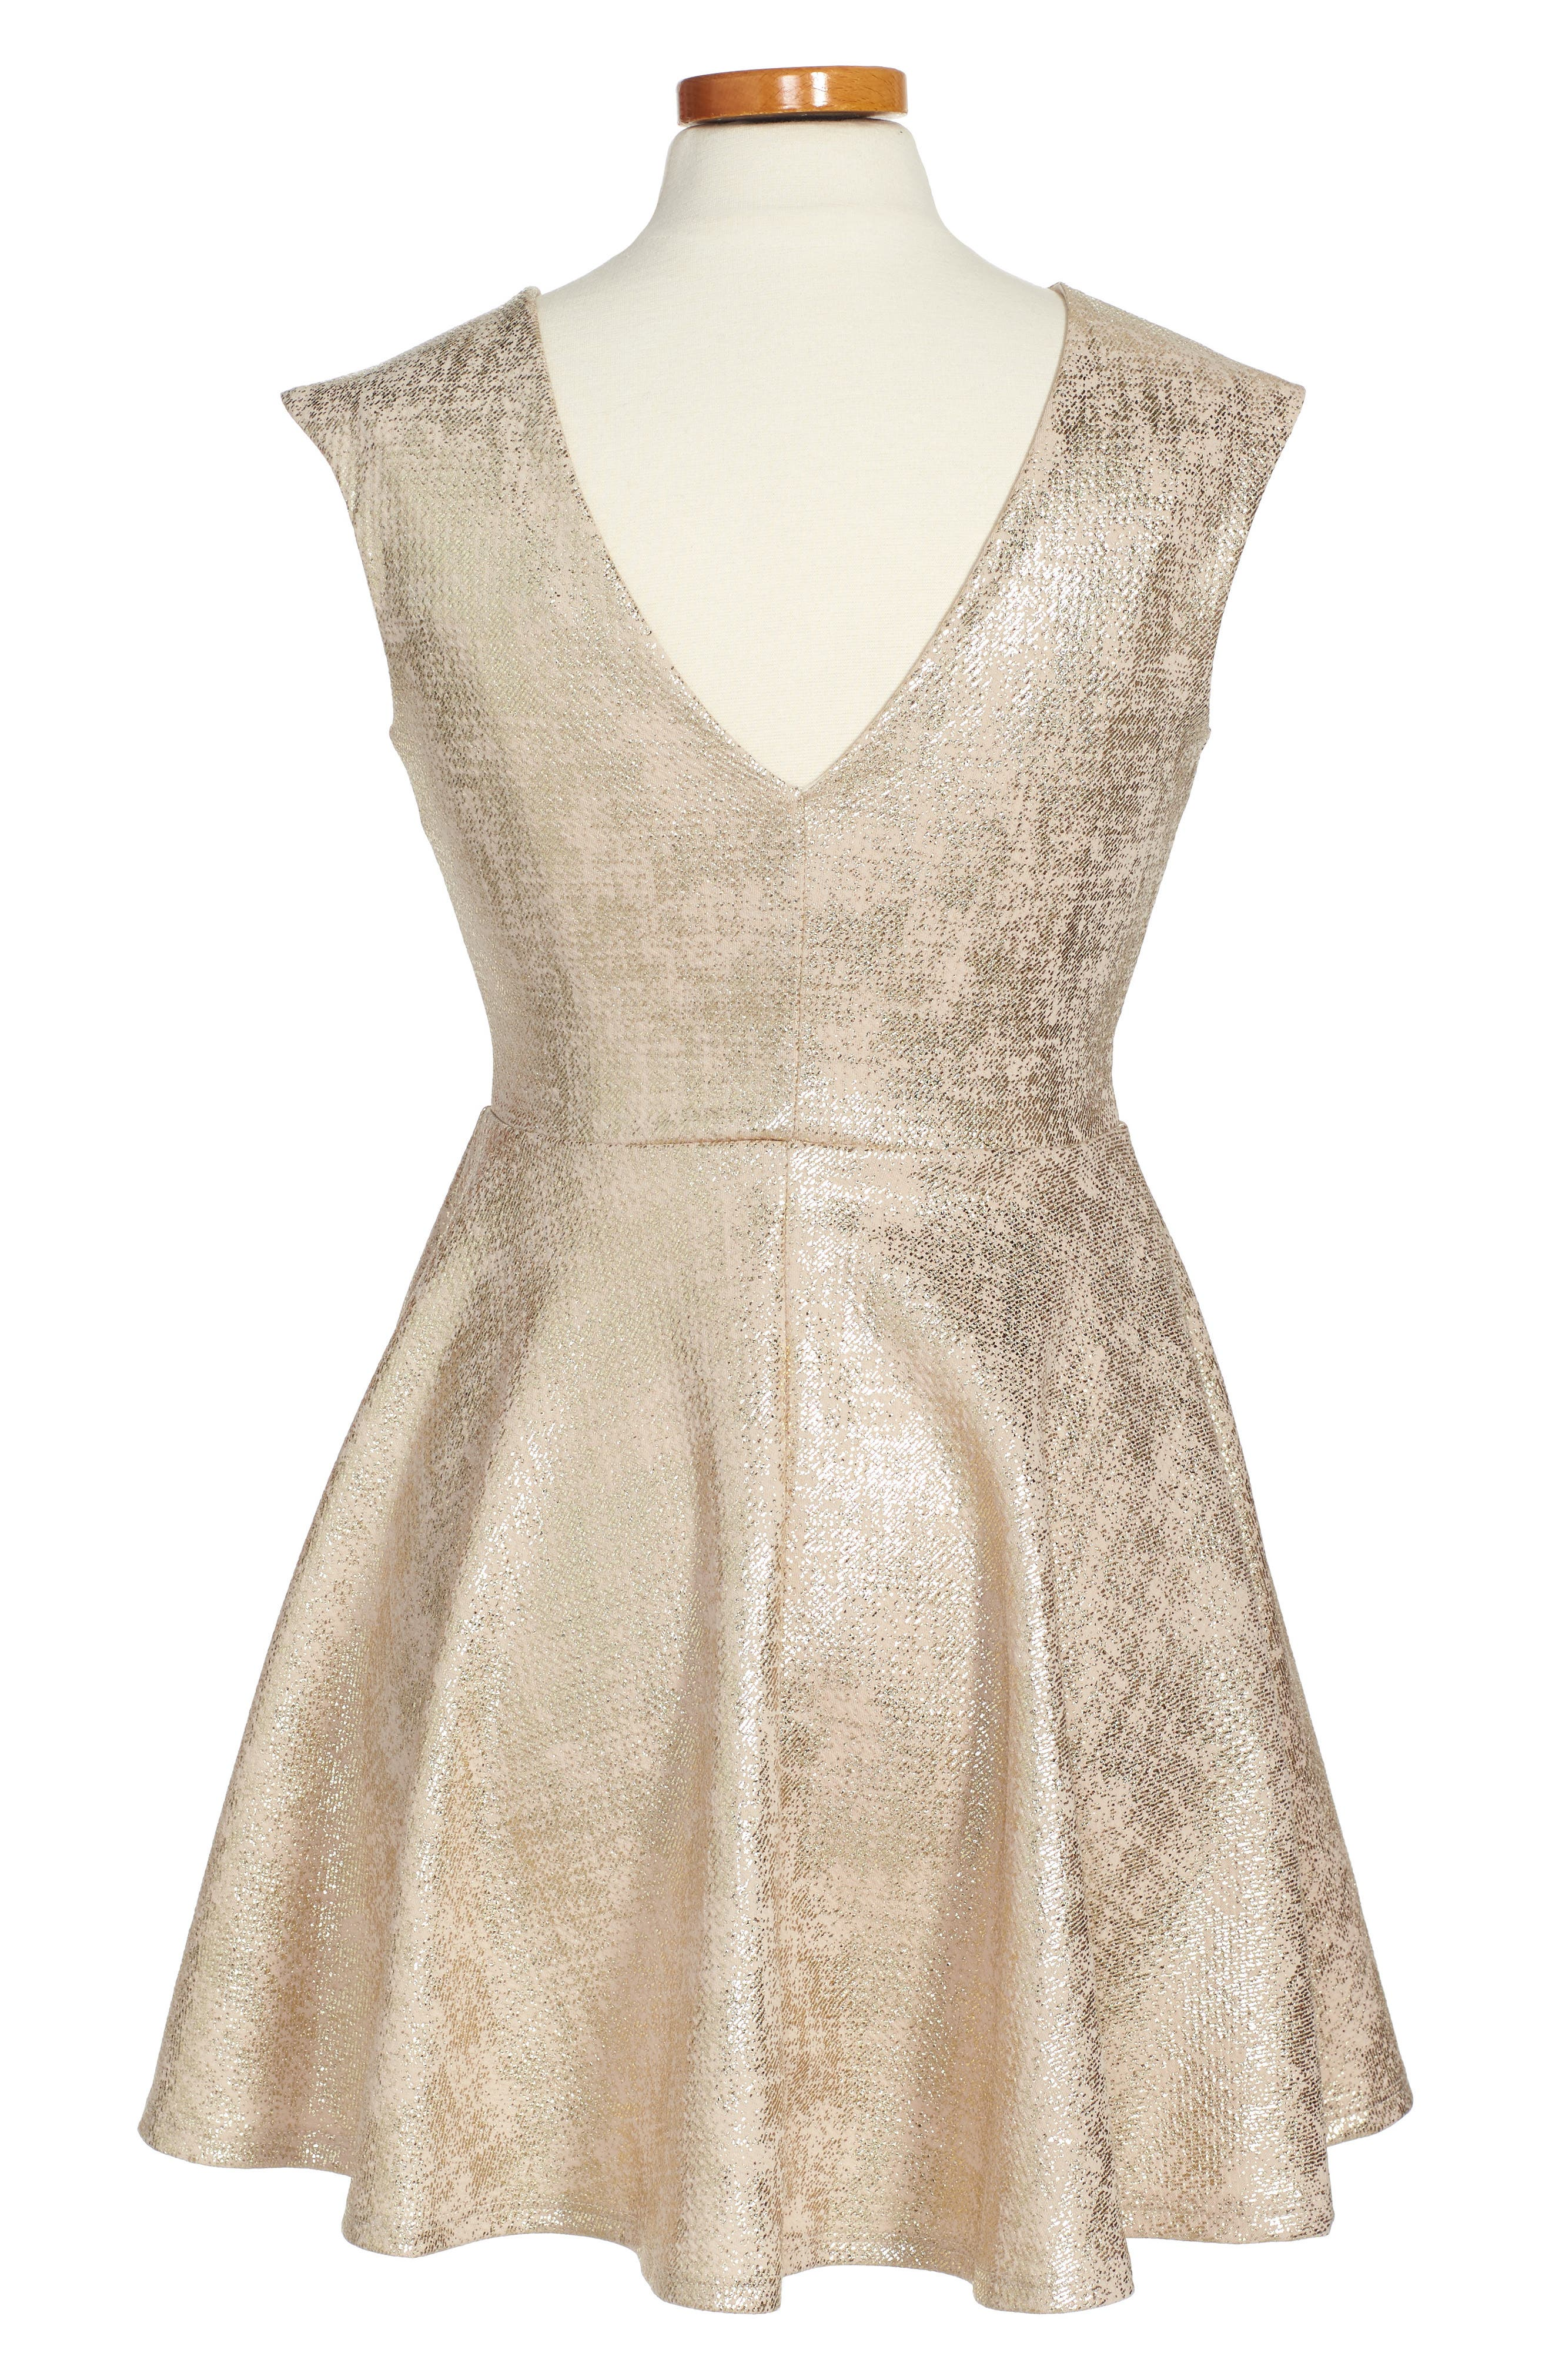 Cap Sleeve Party Dress,                             Alternate thumbnail 2, color,                             710